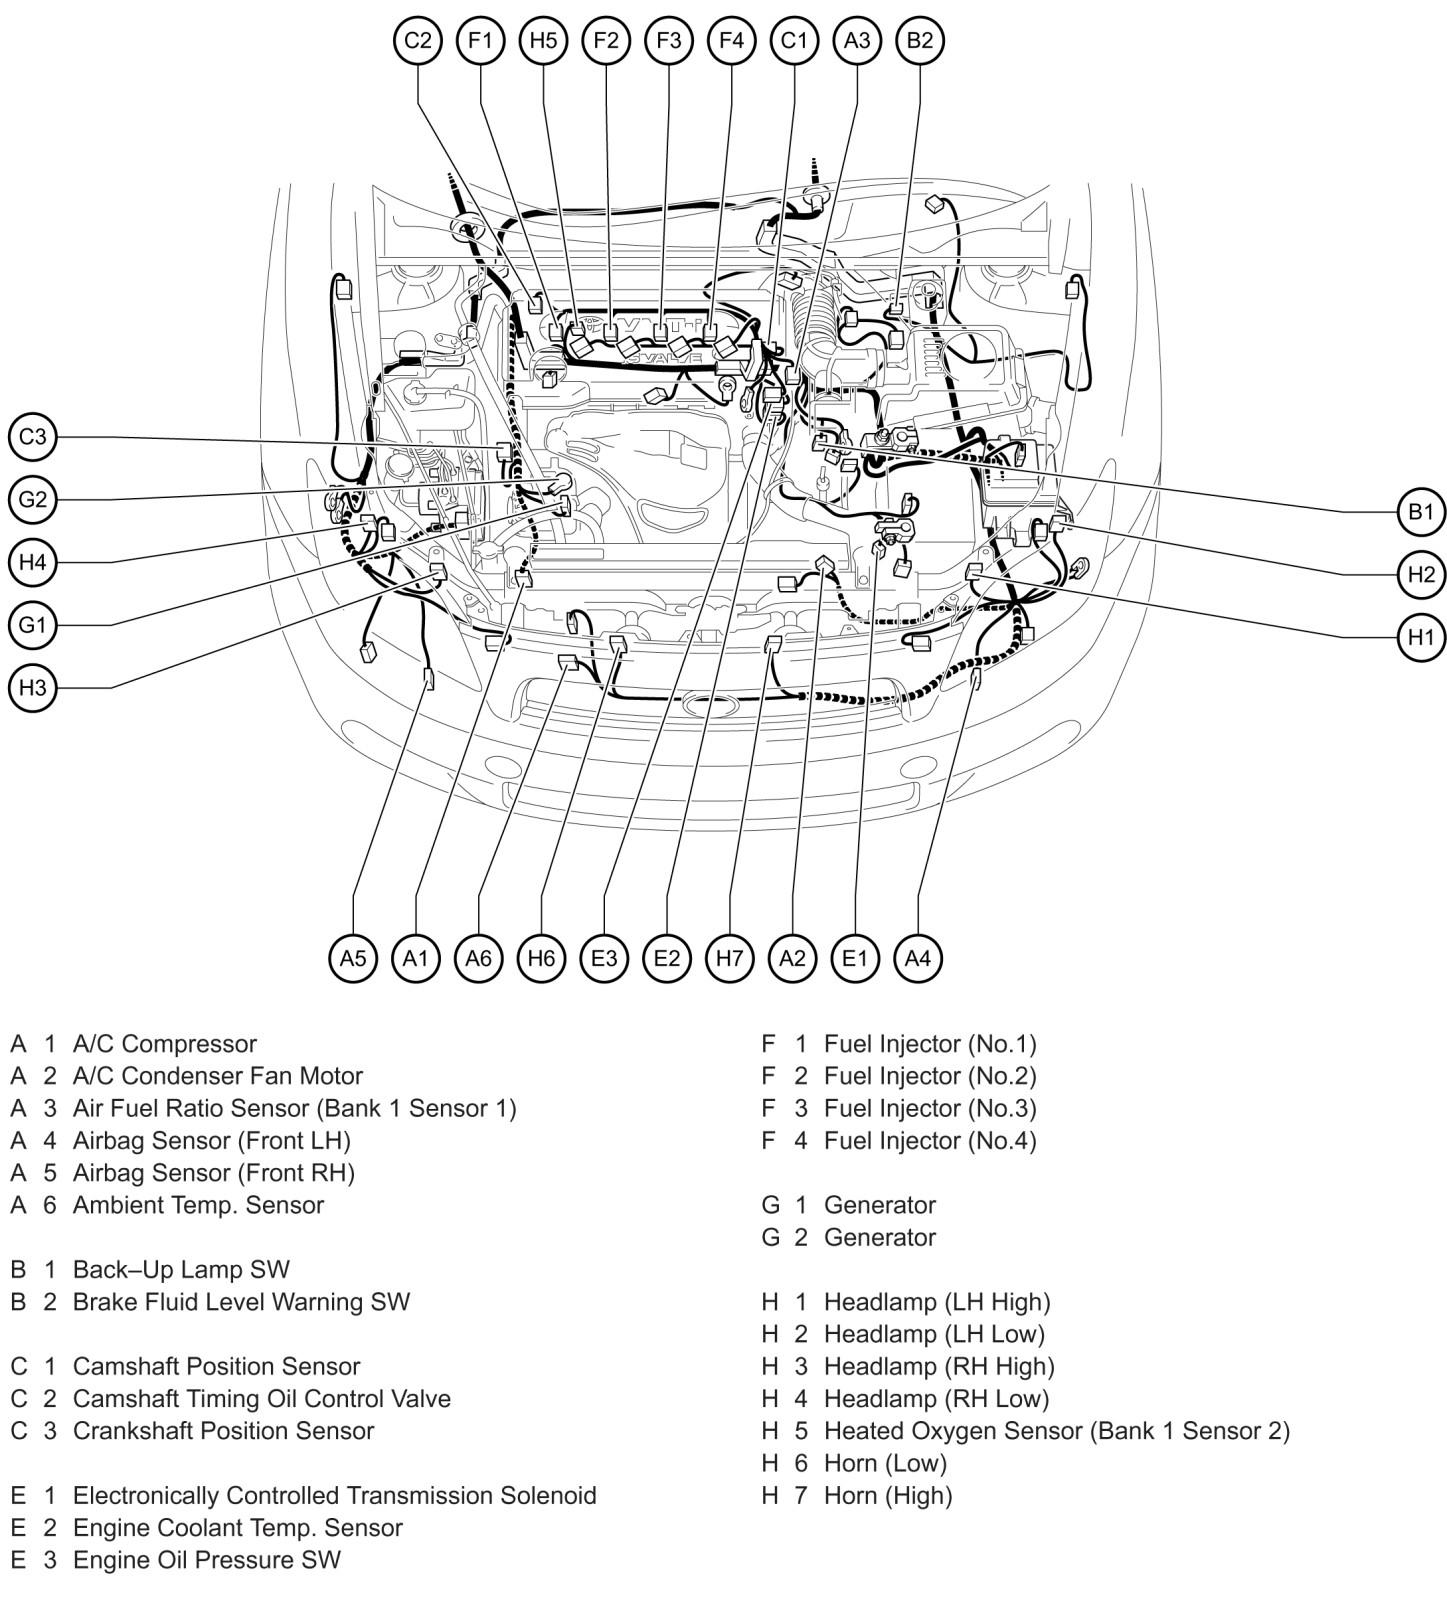 Scion xa engine diagram my wiring diagram 2004 scion xa engine diagram 2005 scion xa fuse diagram